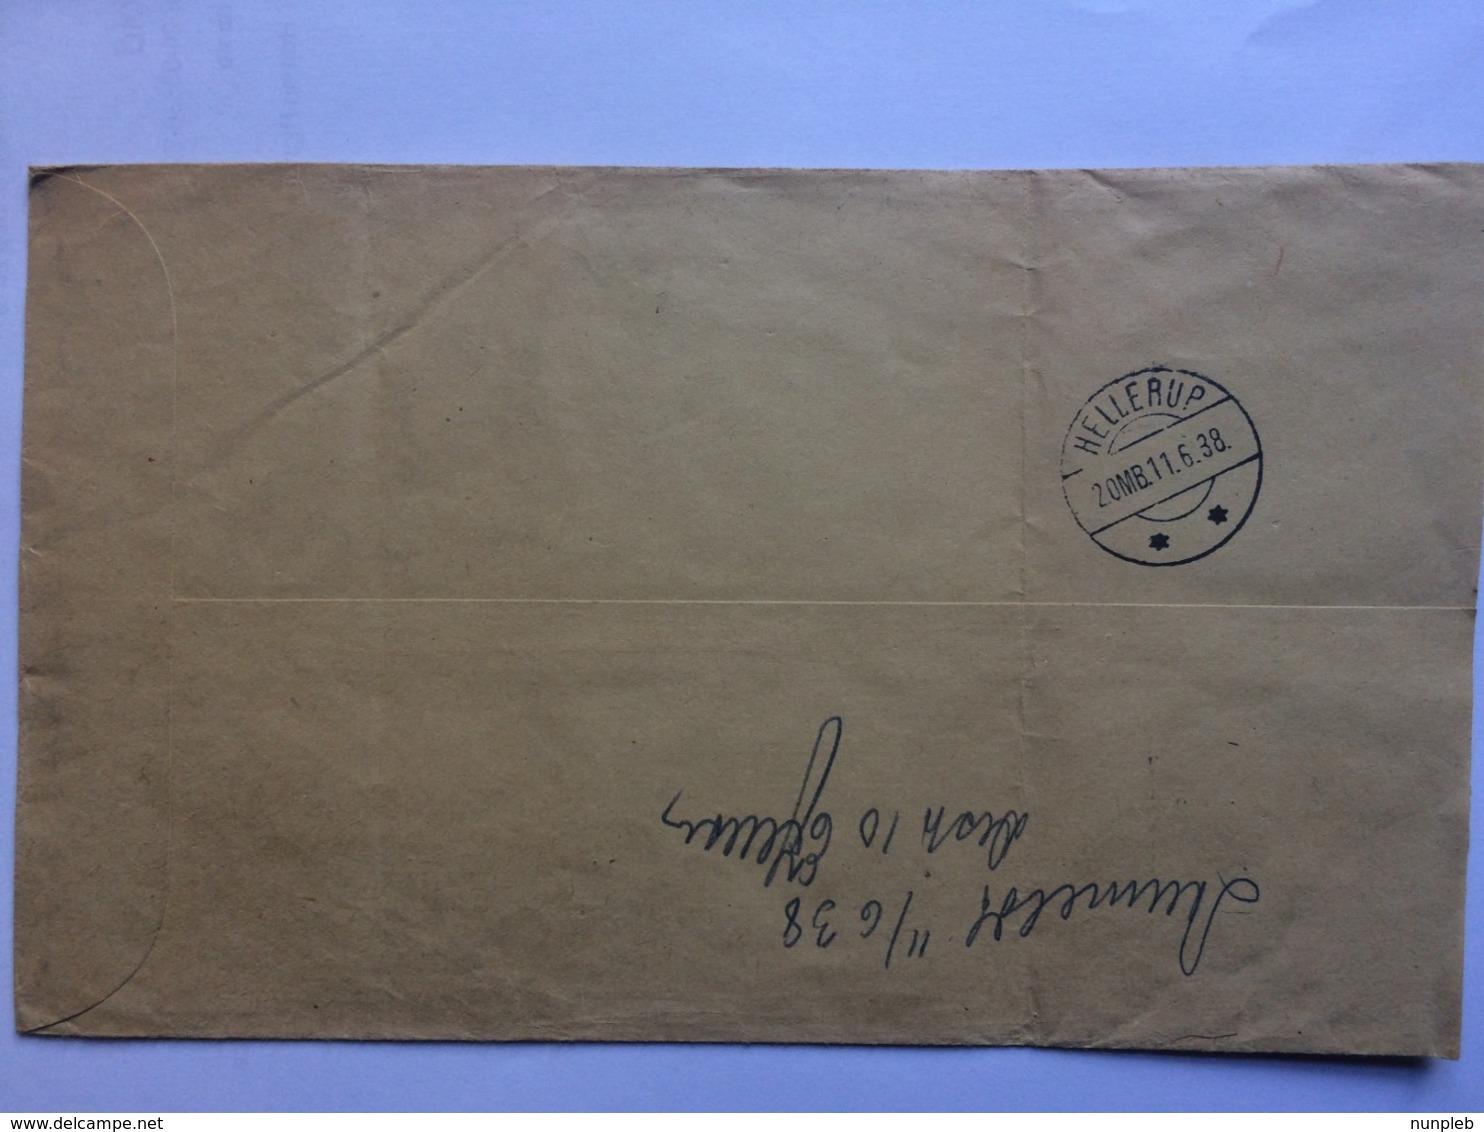 GERMANY 1938 Registered Hamburg Cover To Hellerup Denmark - Germany